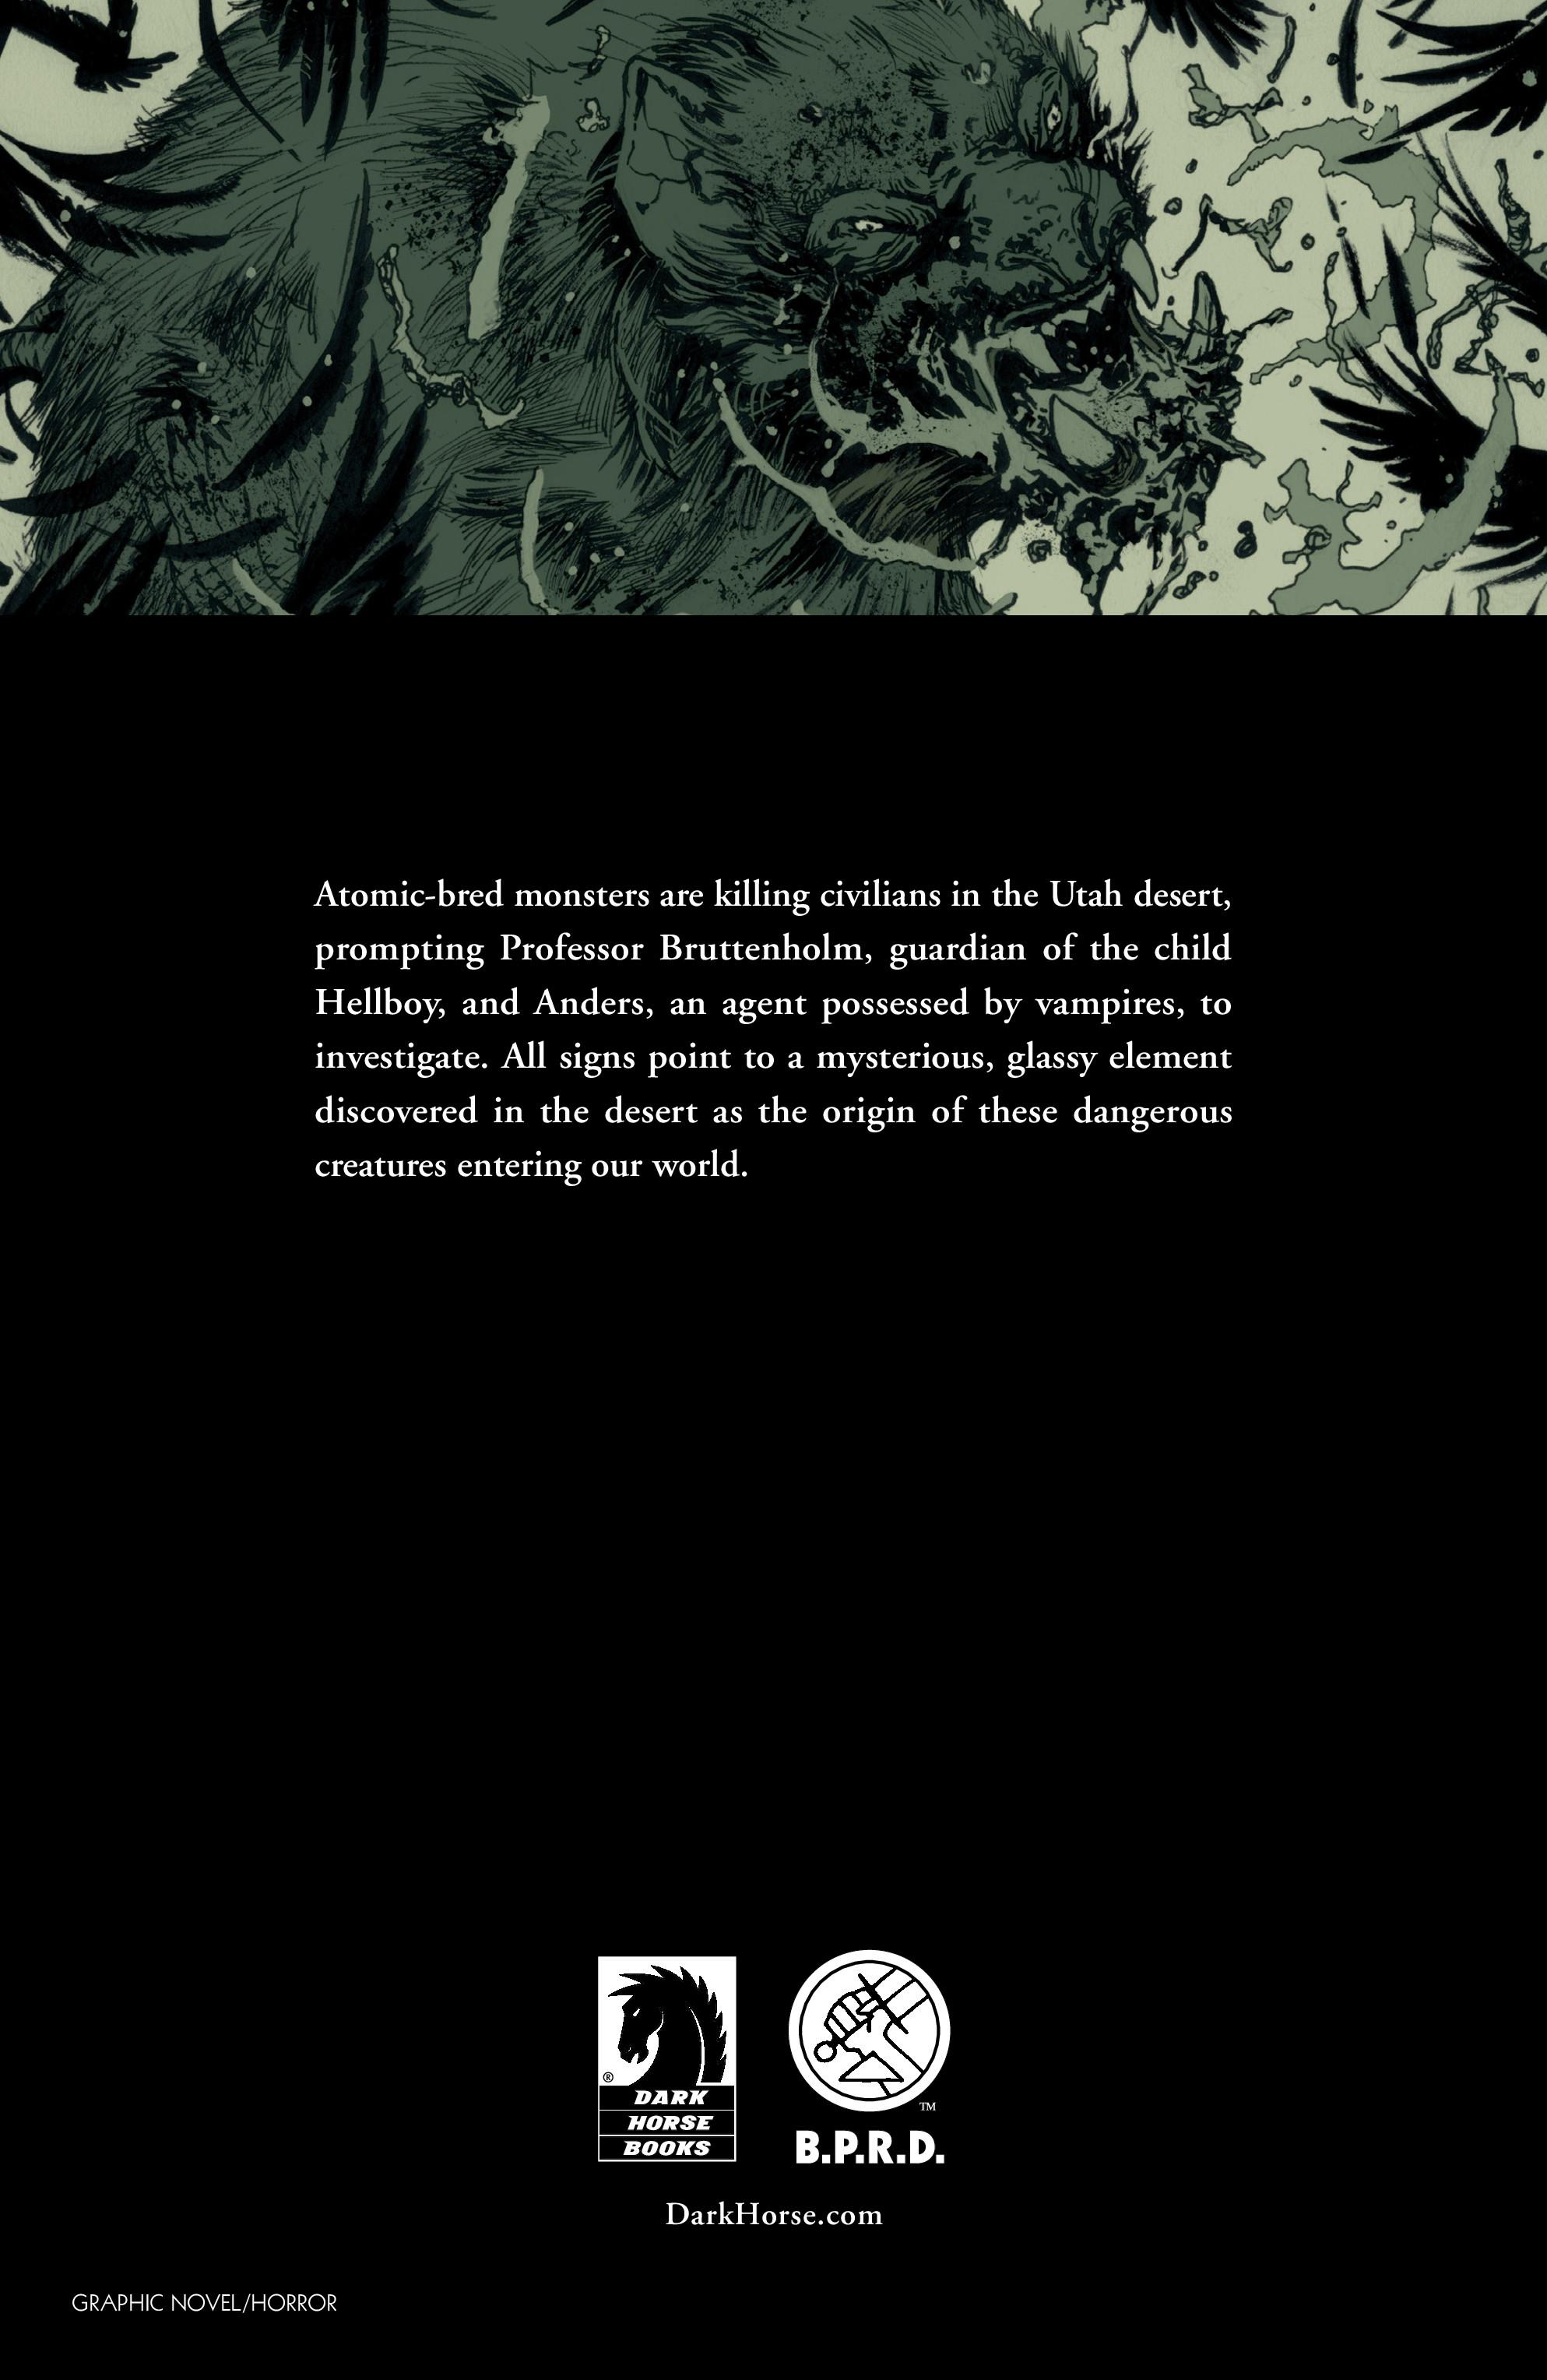 Read online B.P.R.D.: 1948 comic -  Issue # TPB - 143